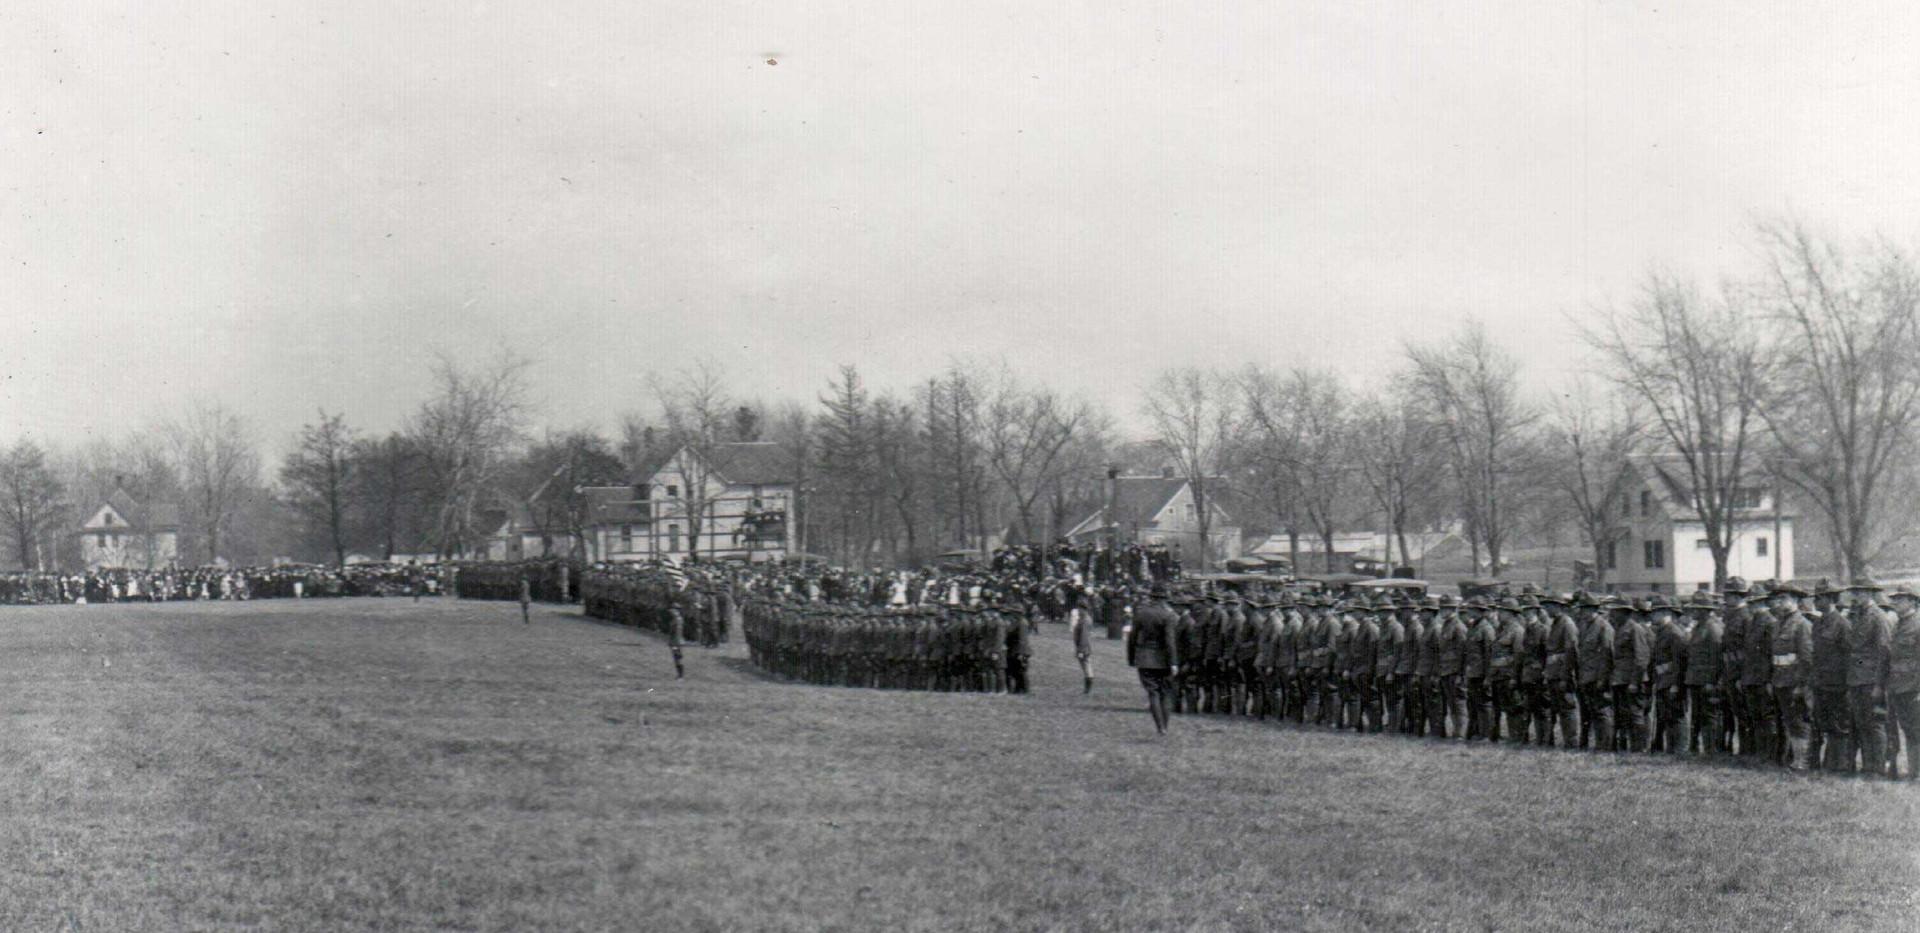 Parade_Battalion_Companies_1919.jpg